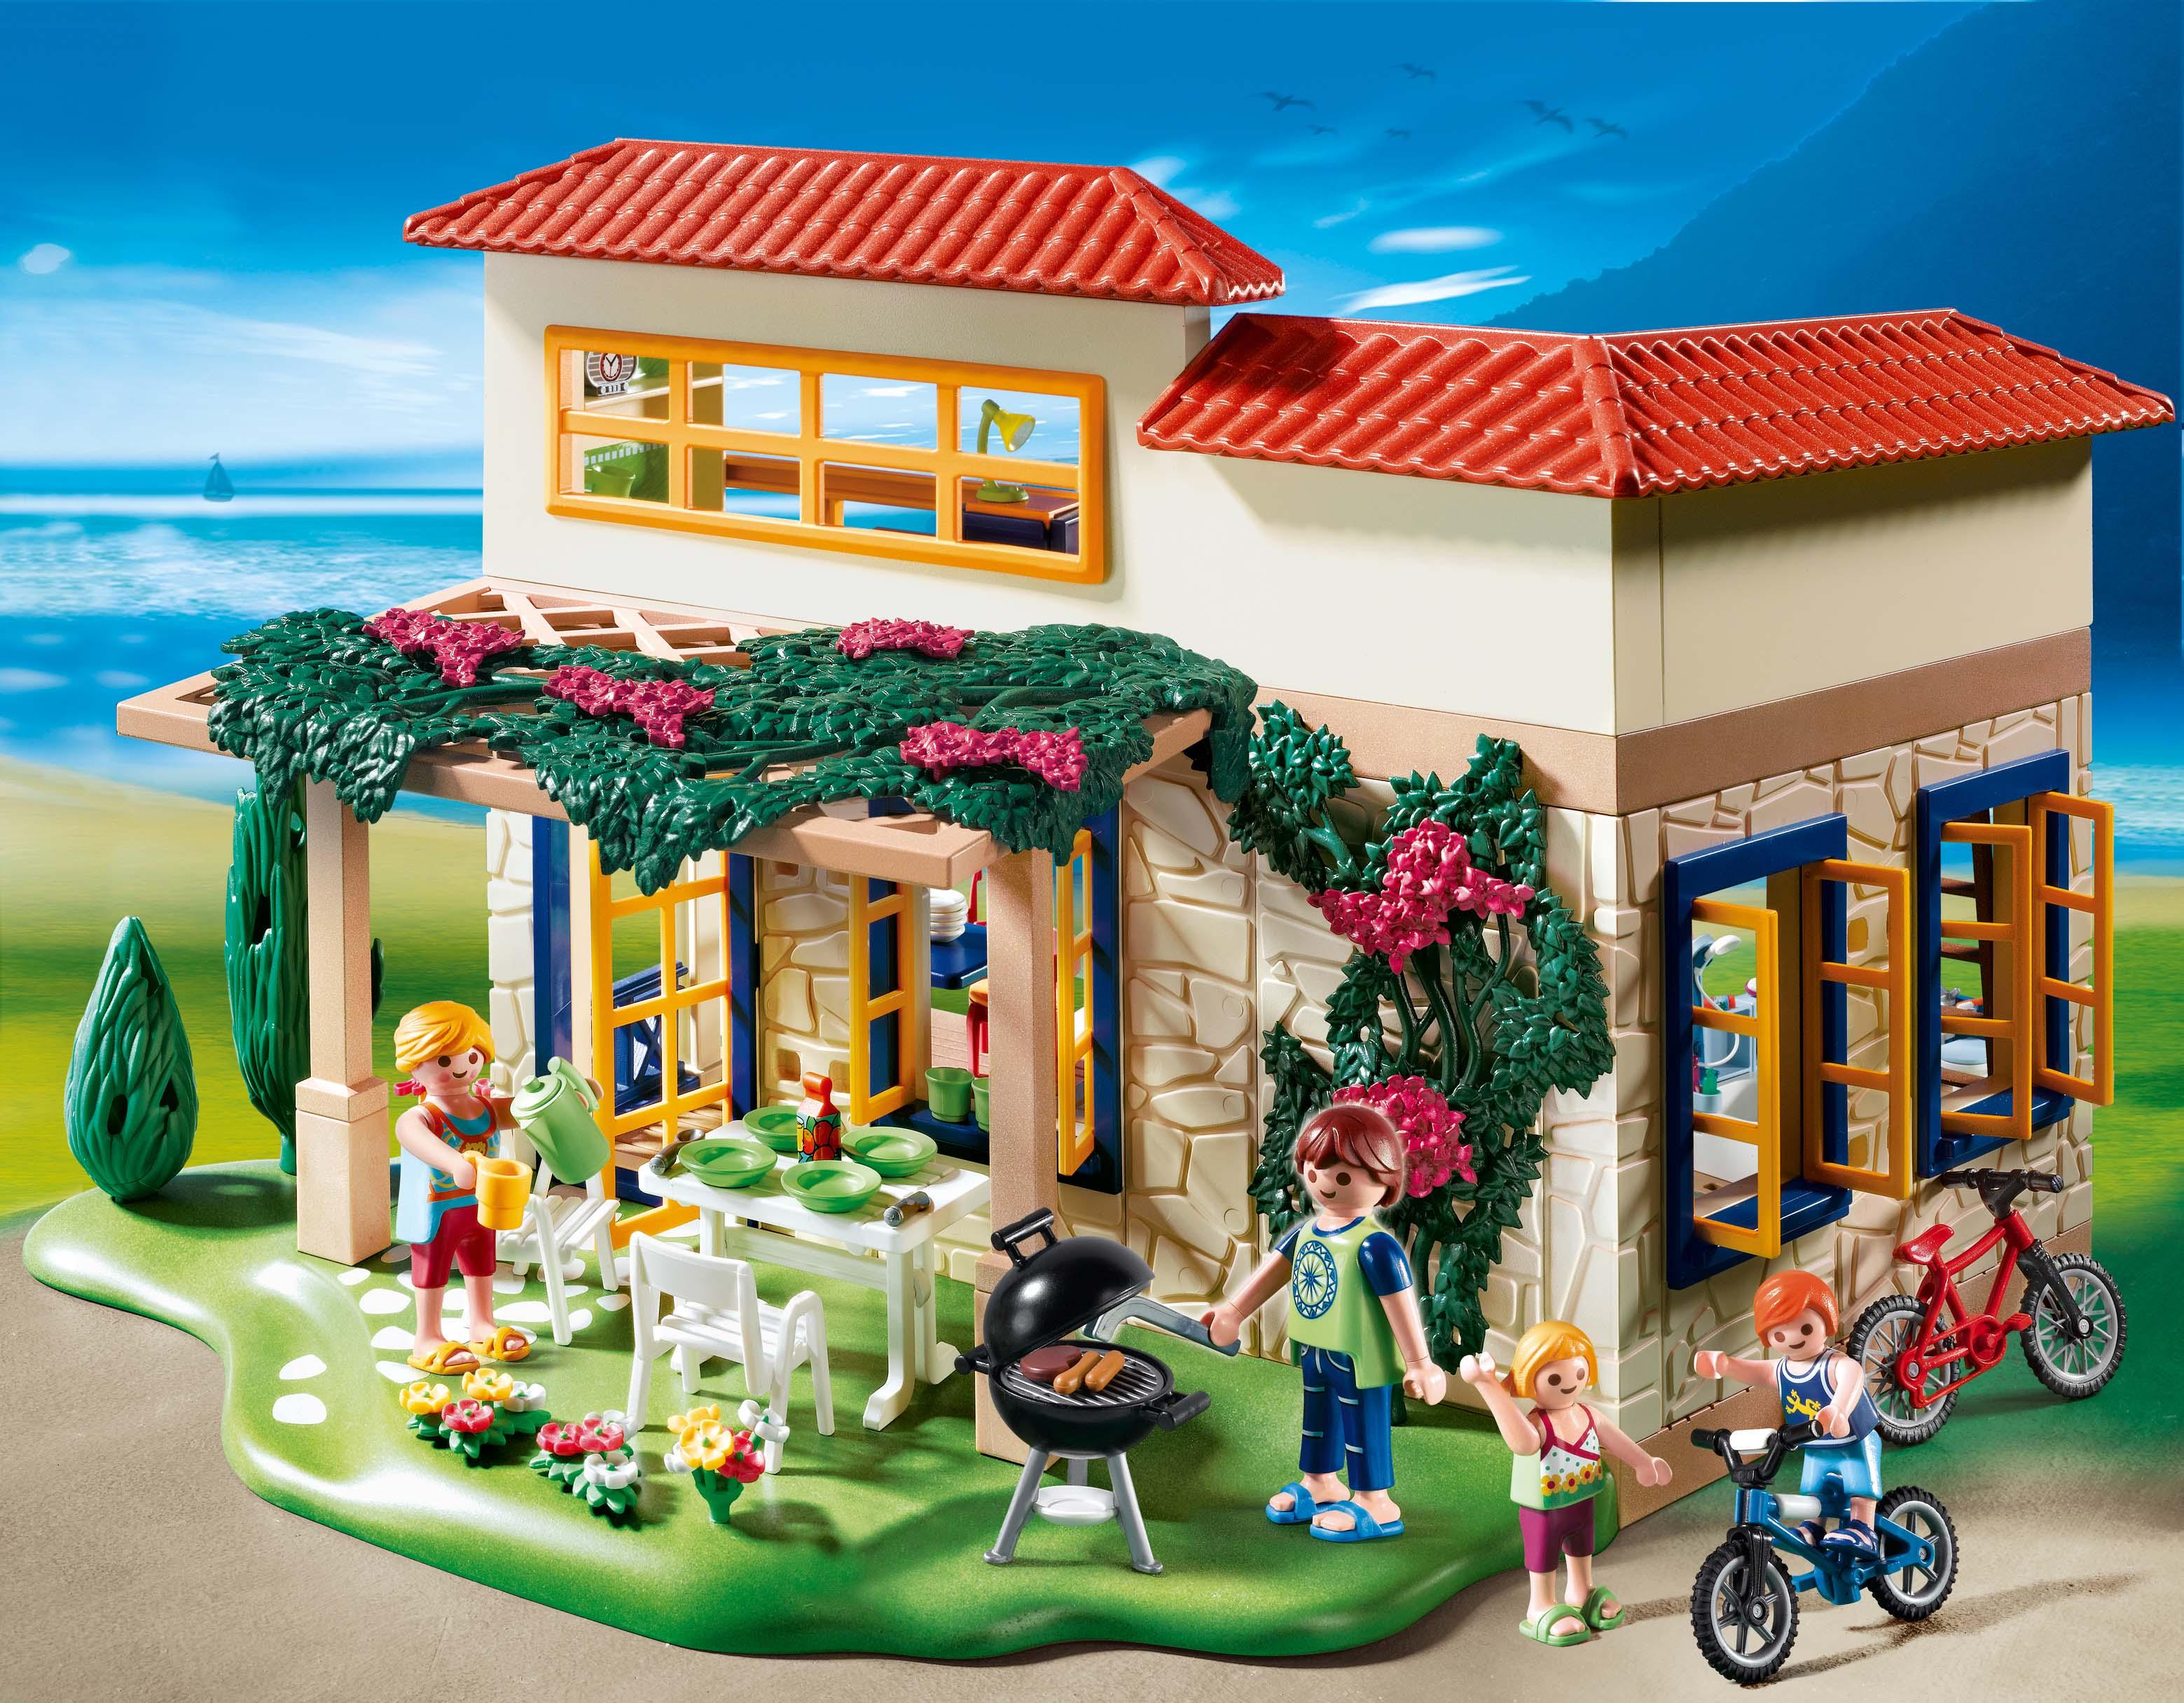 Playmobil_4857 Built_Summer House (2)